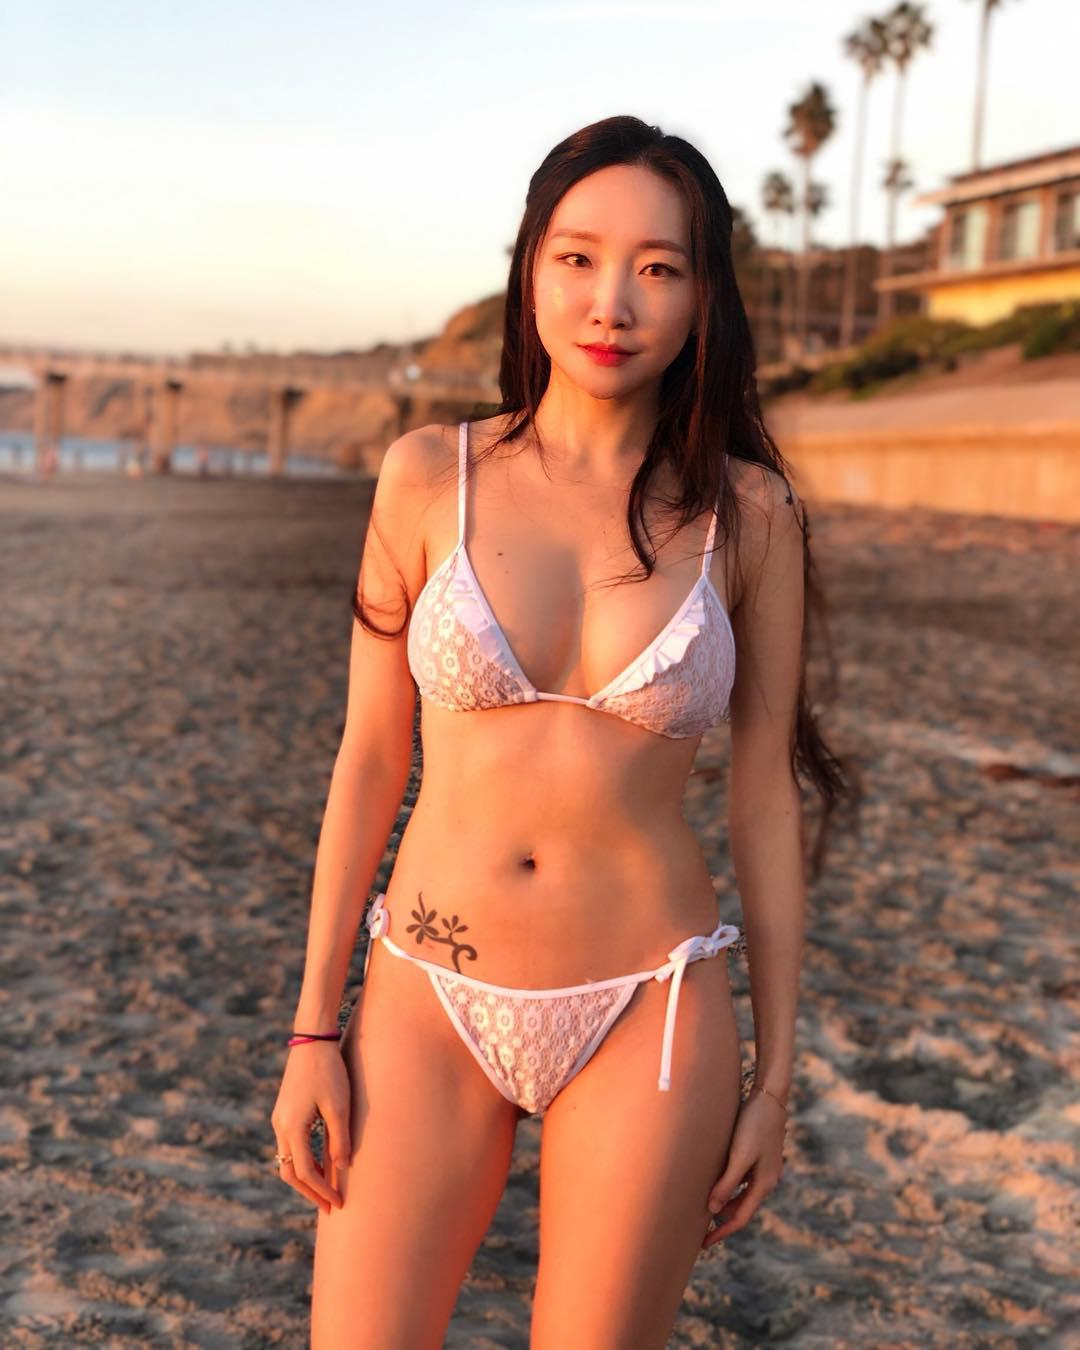 Korean Girl Nahna Bikini Pictures